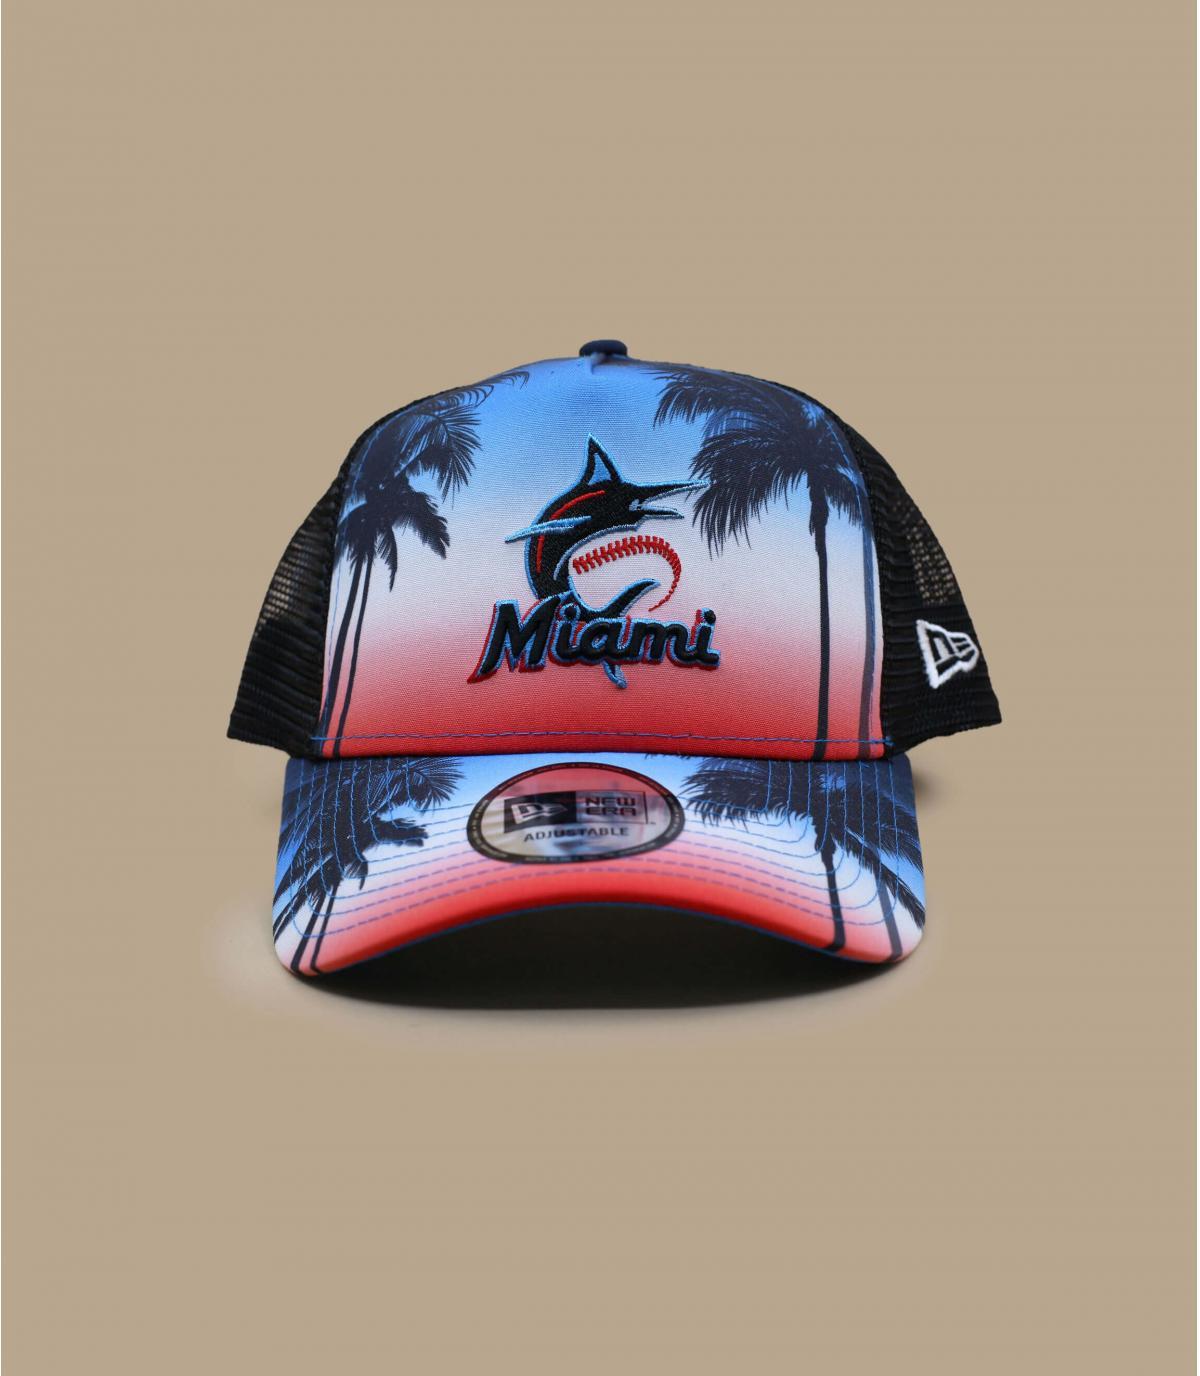 Details Trucker Summer City Miami Marlins - afbeeling 2